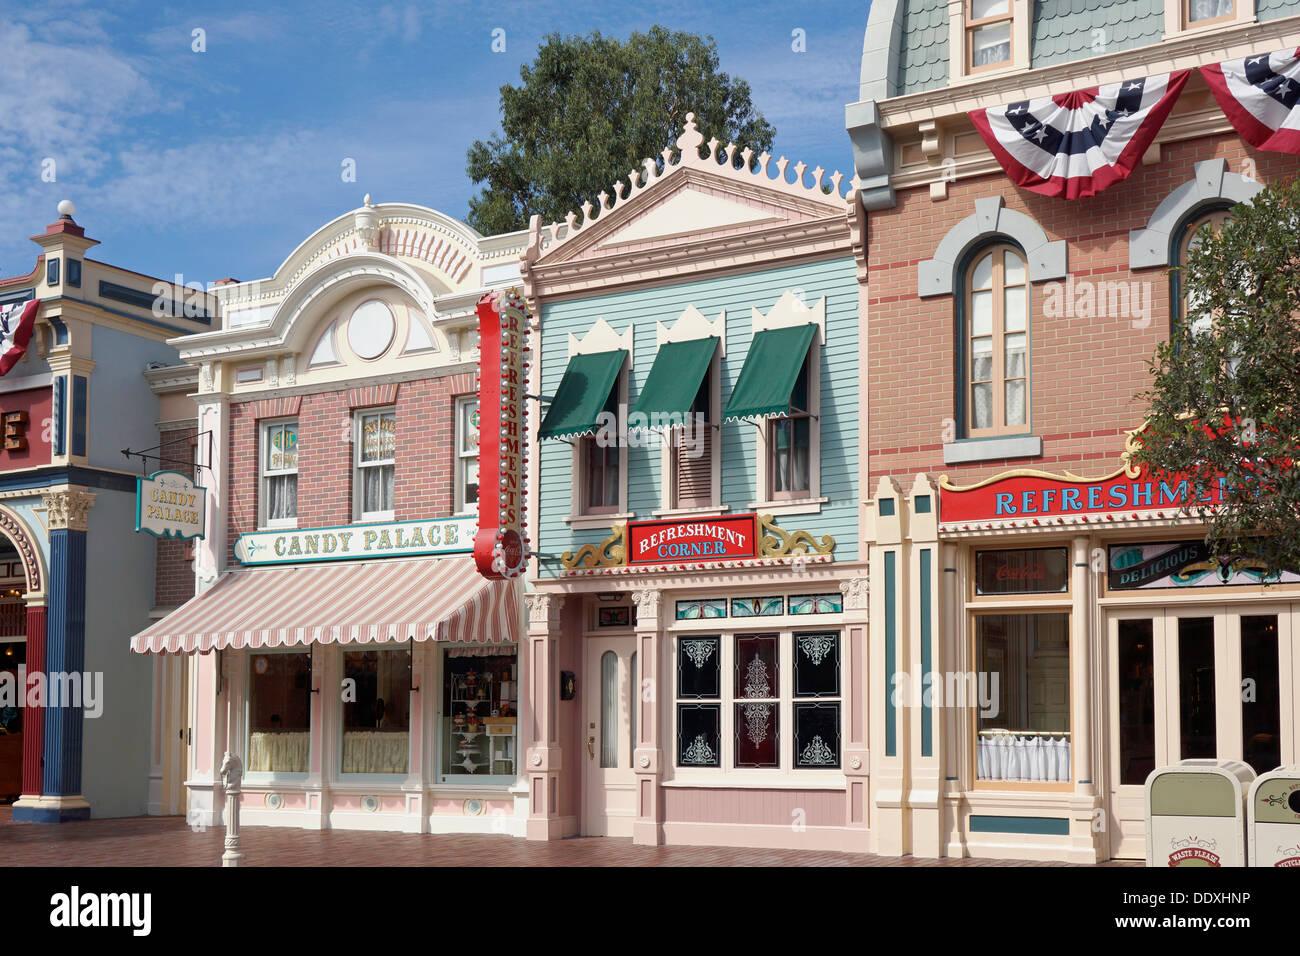 Disneyland, Shops and Eateries along Main Street, Anaheim, California - Stock Image